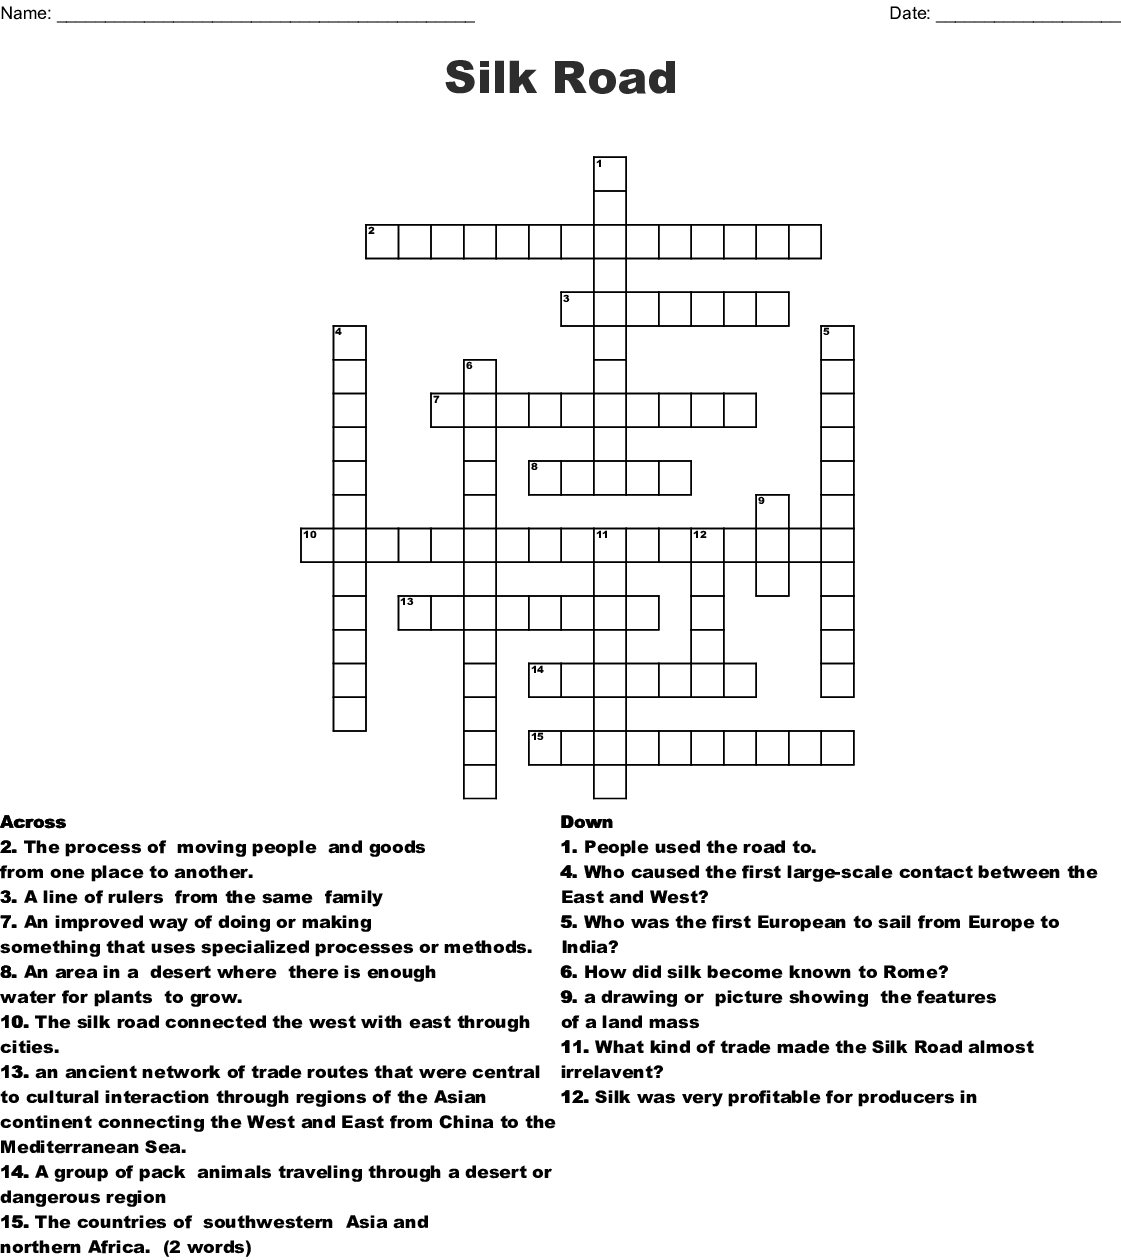 The Silk Road Crossword